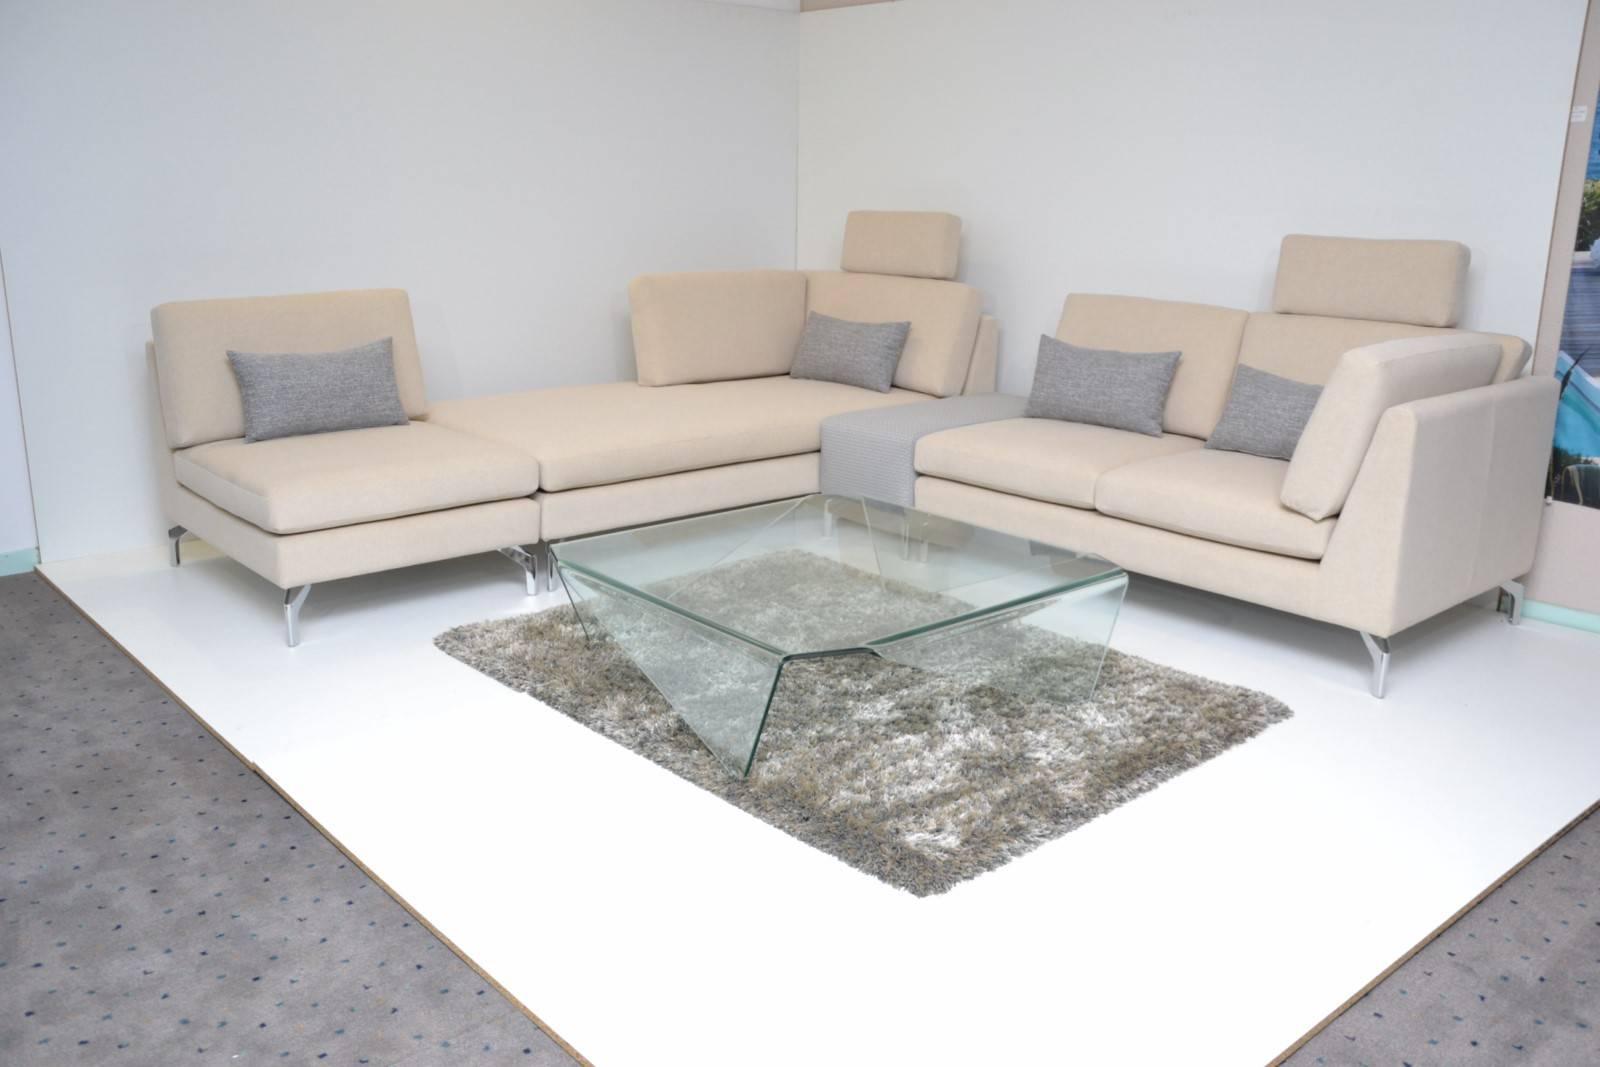 salon d 39 angle anglet avec t ti res fabricant de canap en cuir sur mesure mont de marsan h. Black Bedroom Furniture Sets. Home Design Ideas